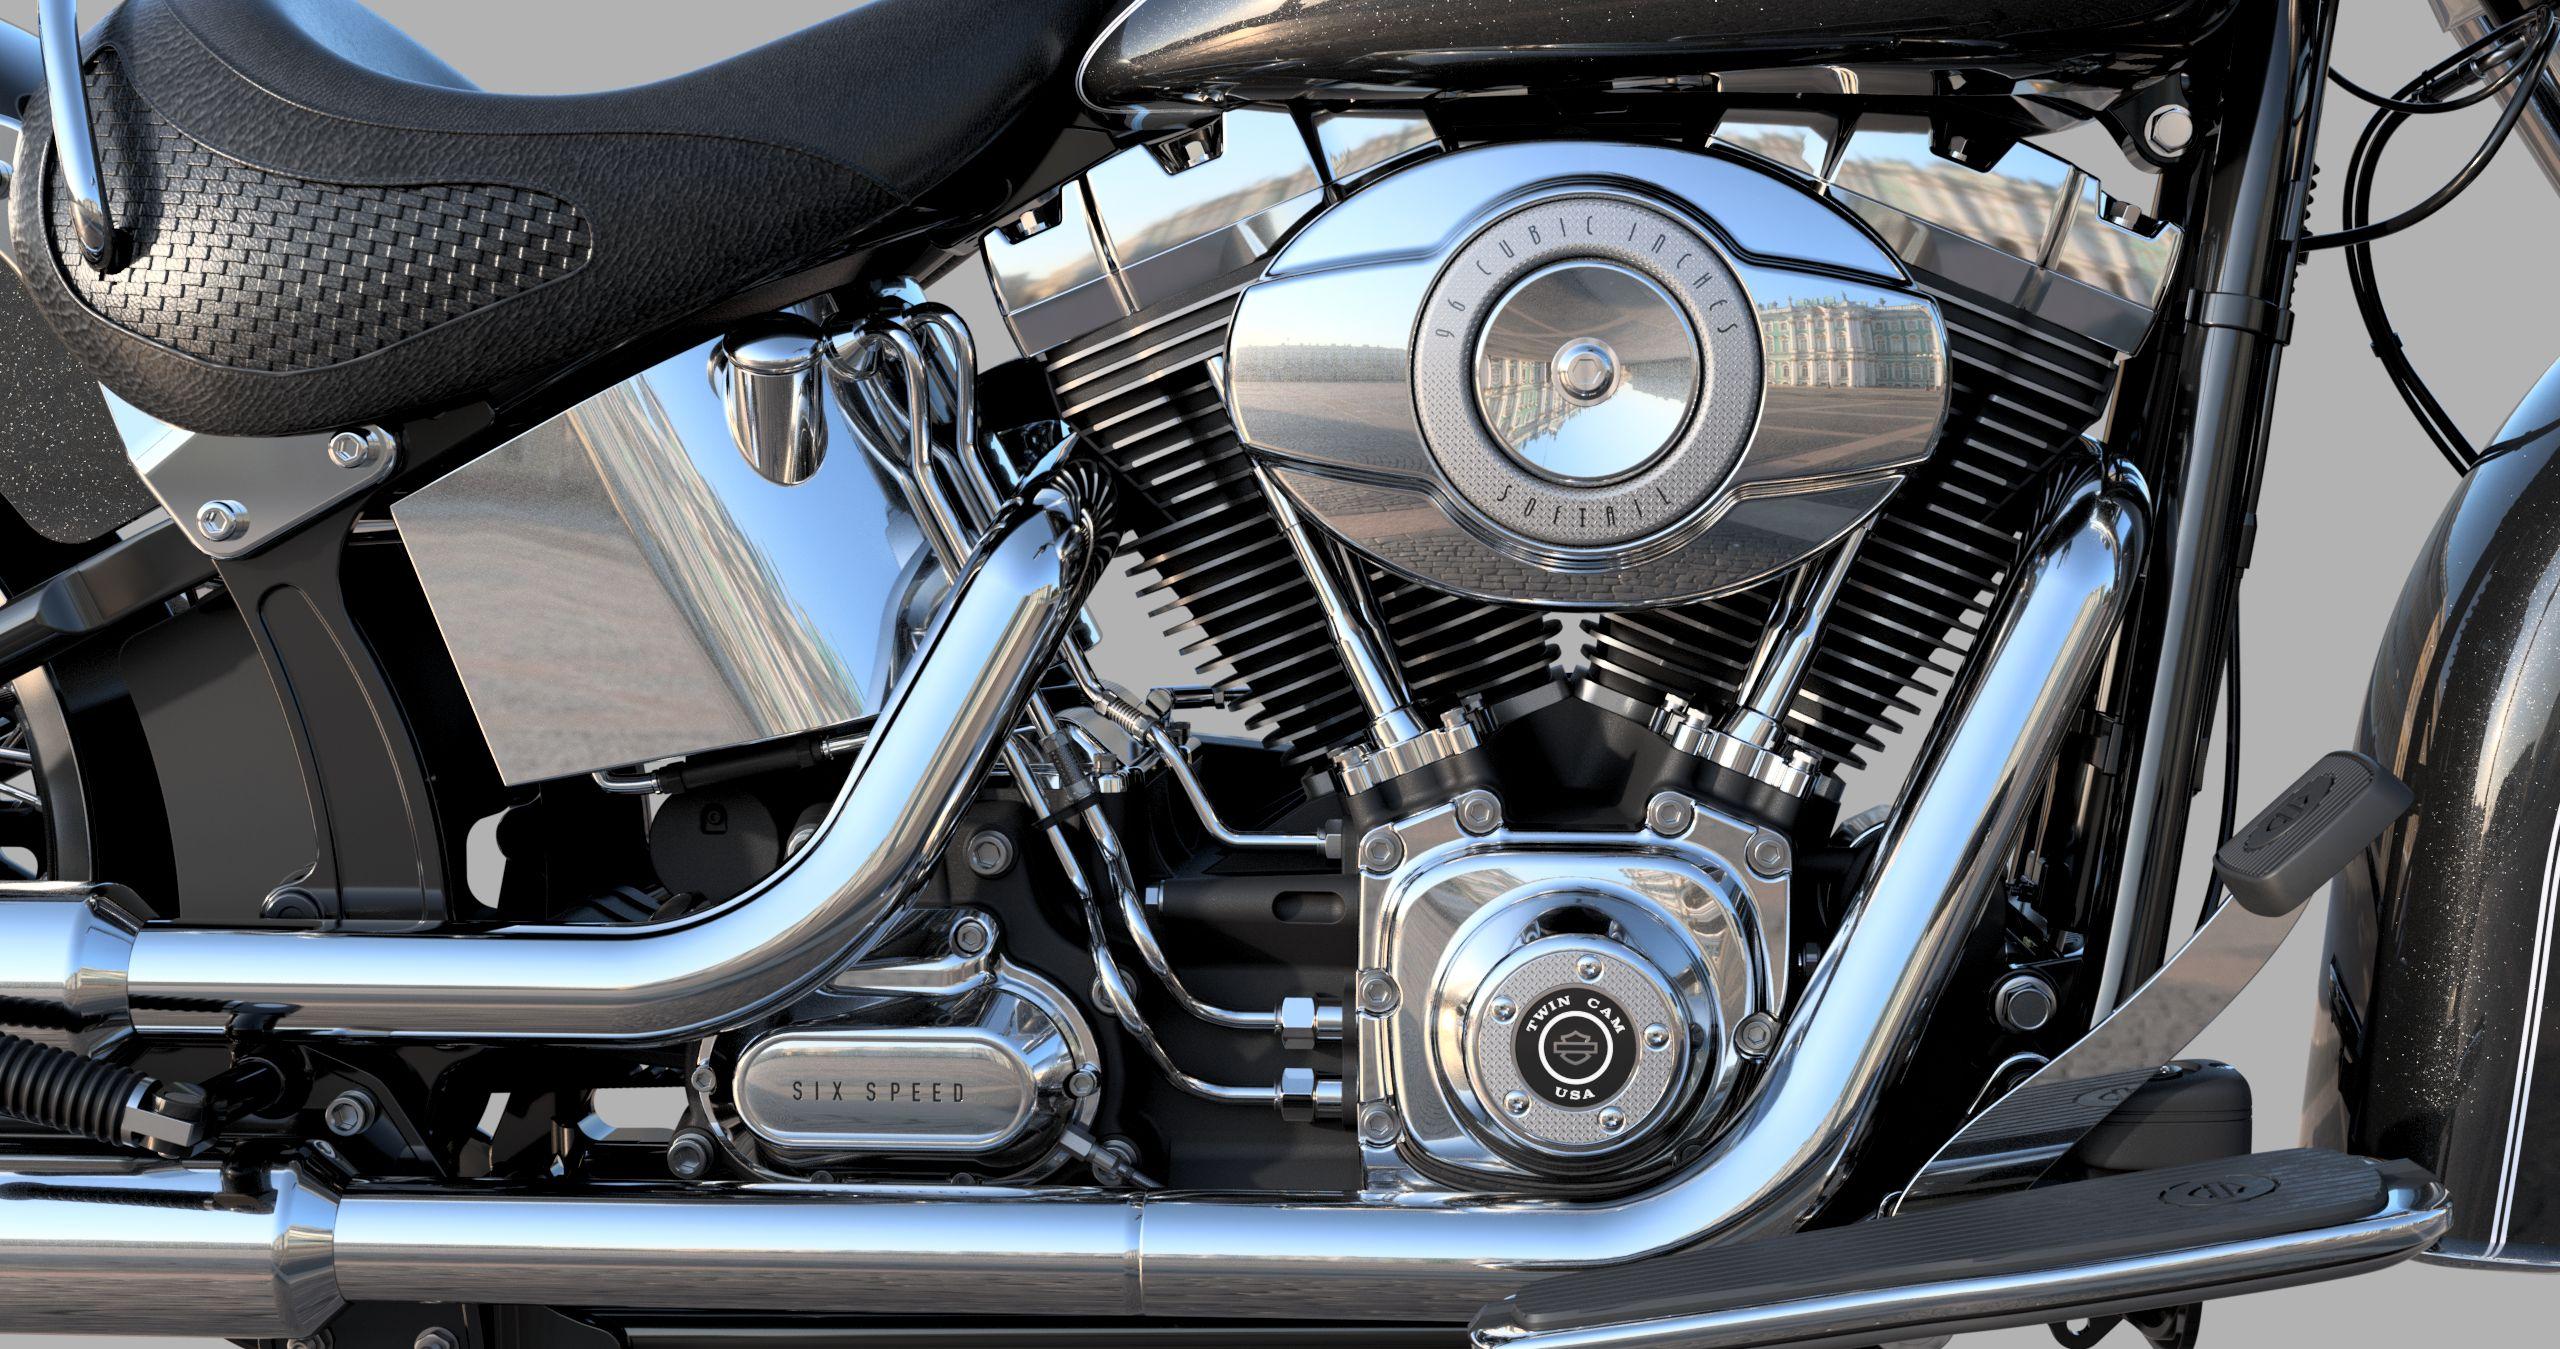 Harley-heritage-enginerightside-3500-3500